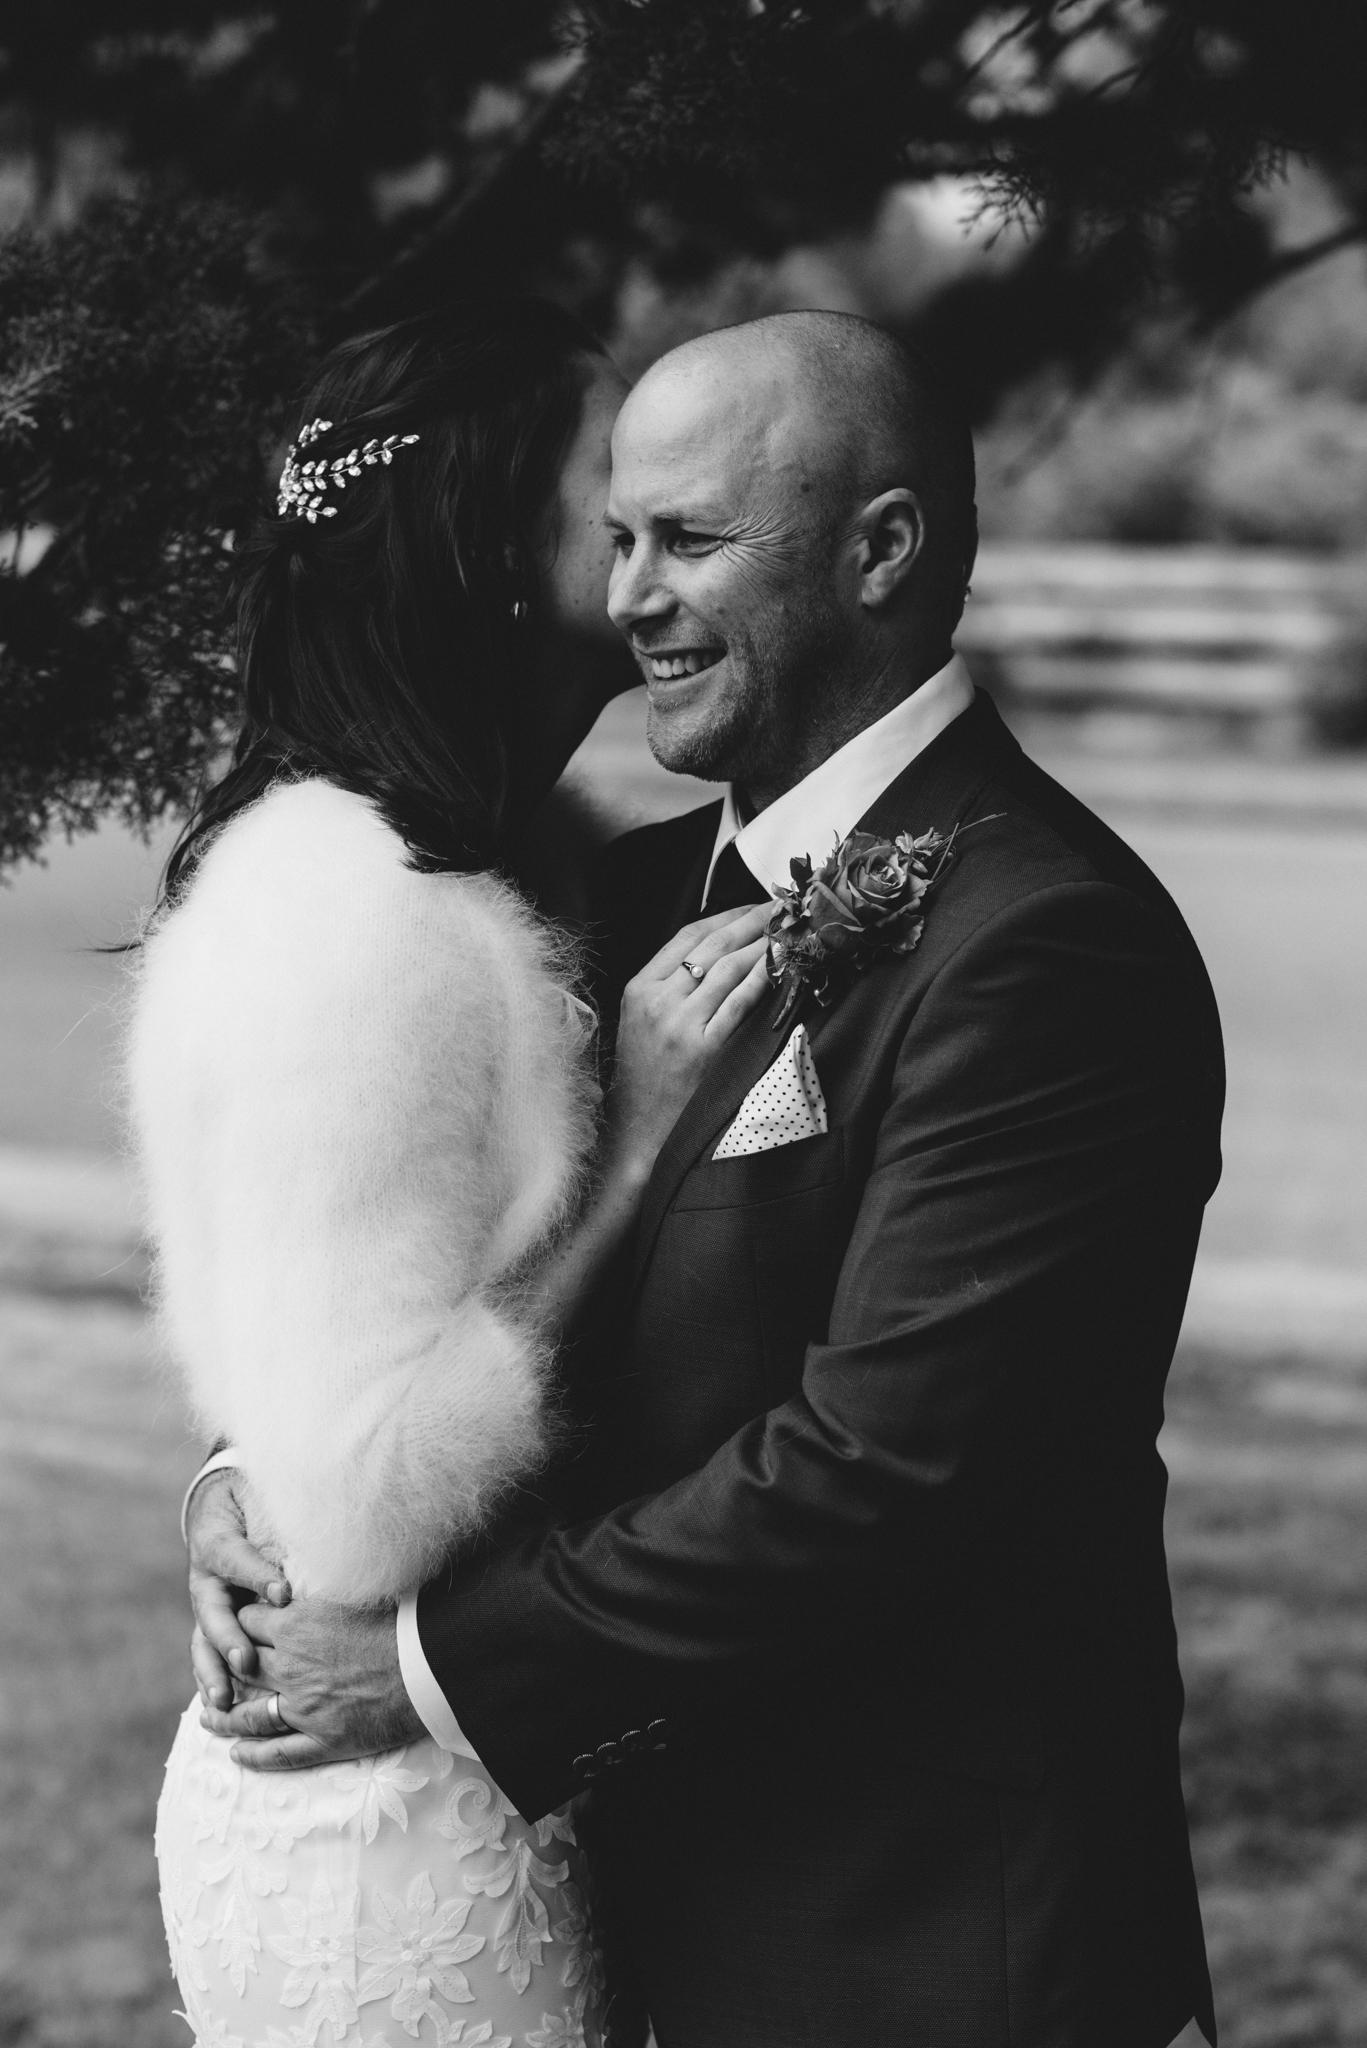 LOVELENSCAPES PHOTOGRAPHY • VISUAL POETRY • NEW ZEALAND WEDDING PHOTOGRAPHER • AUSTRALIAN WEDDING PHOTOGRAPHER • BRISBANE • MELBOURNE • SYDNEY • HOBART • TARUREKA ESTATE • ANNA CAMPBELL • 152.jpg